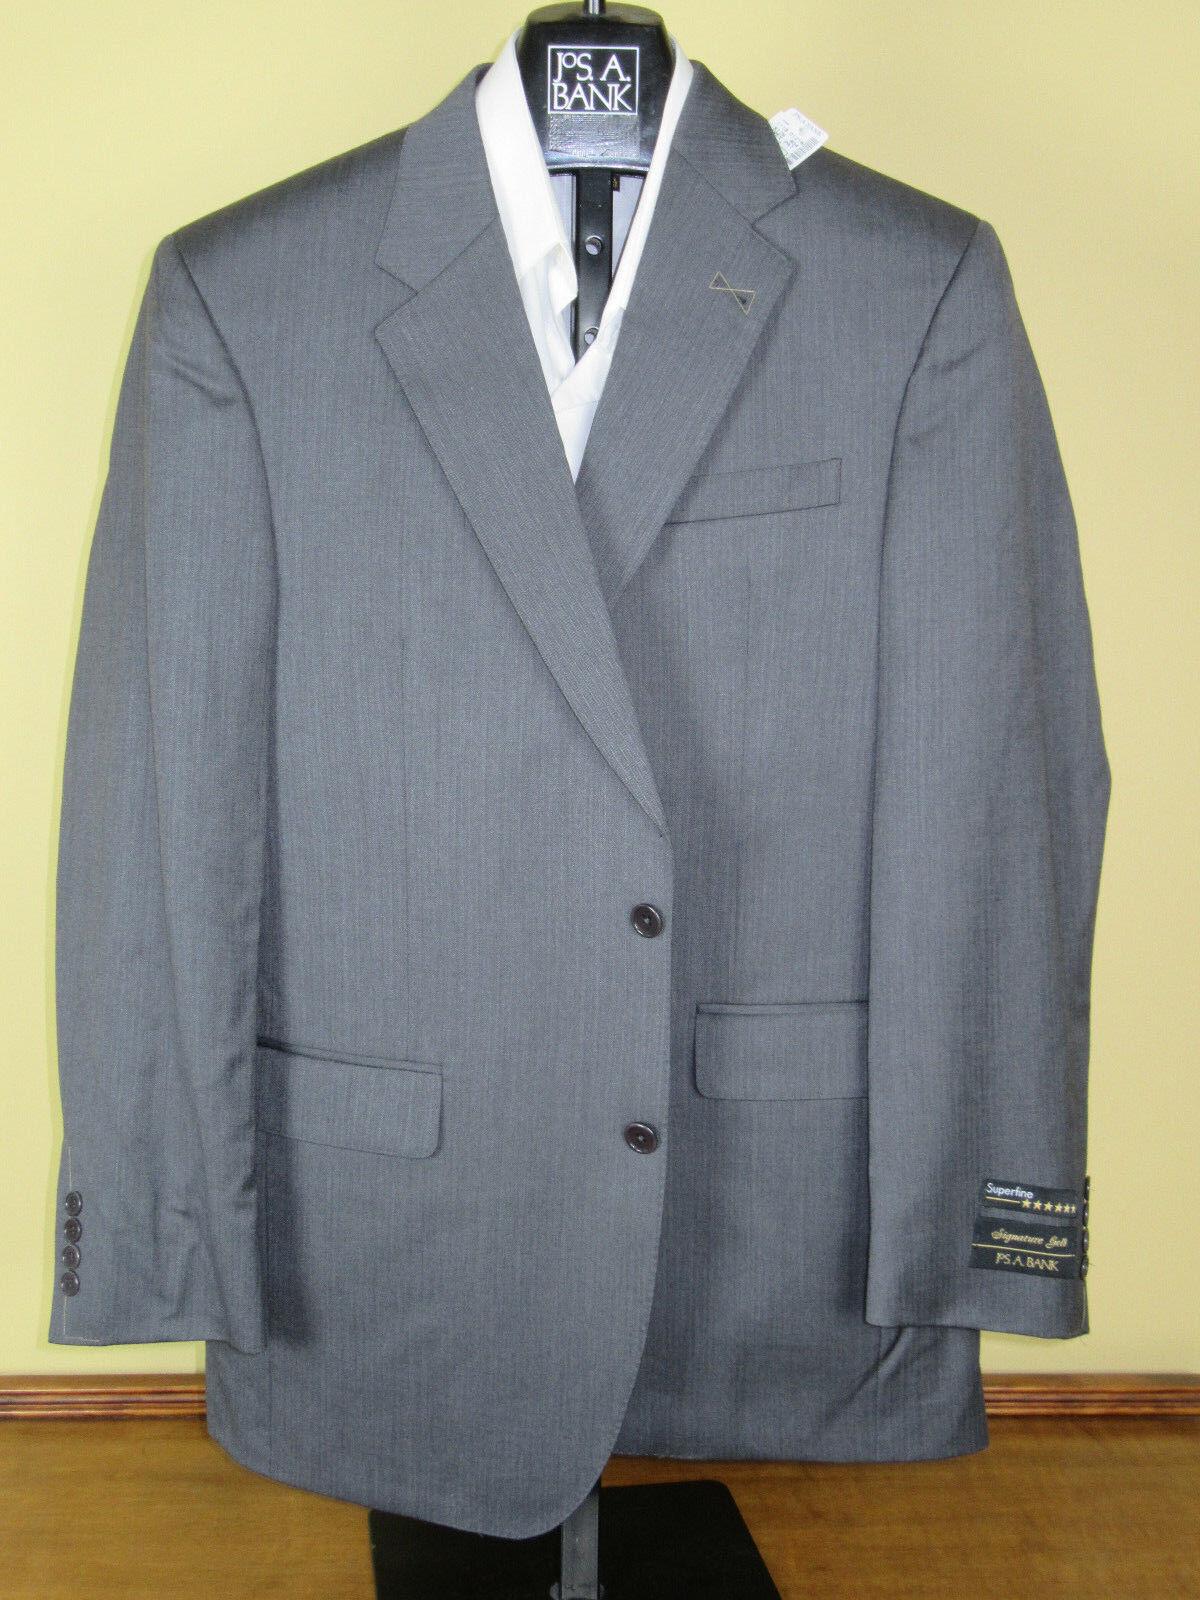 1295 new Jos A Bank Signature Gold grau pattern suit 40 L 34 W w/ free 99 tie